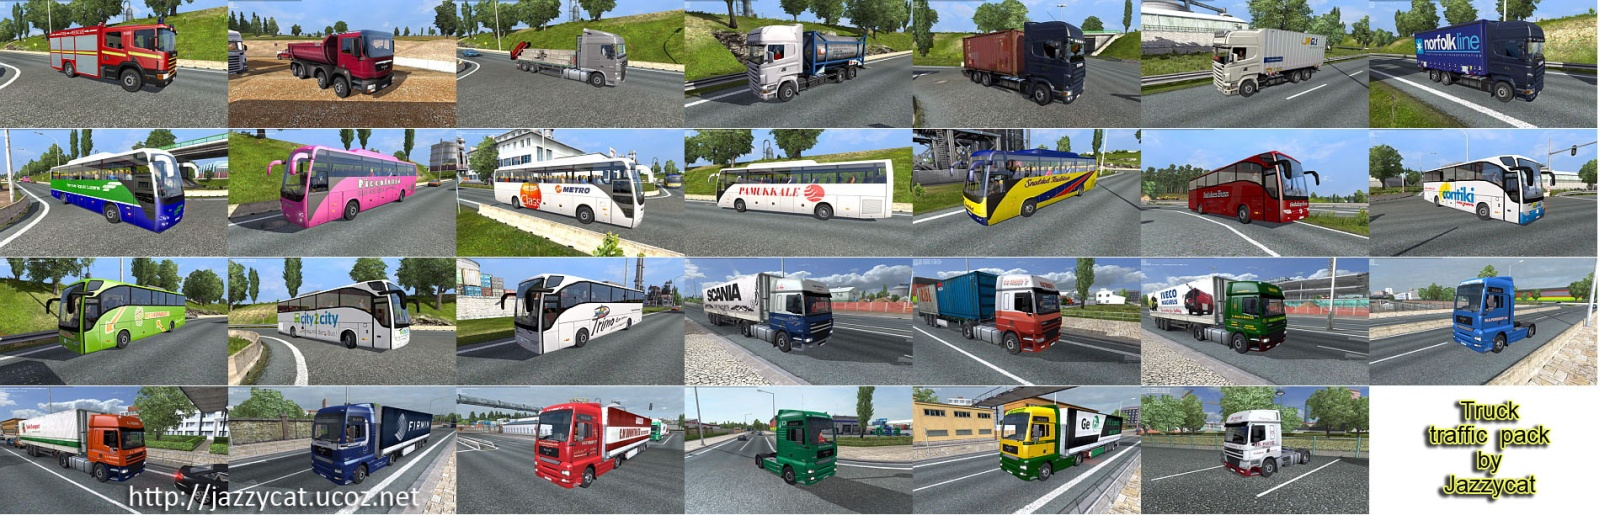 Truck Traffic Pack